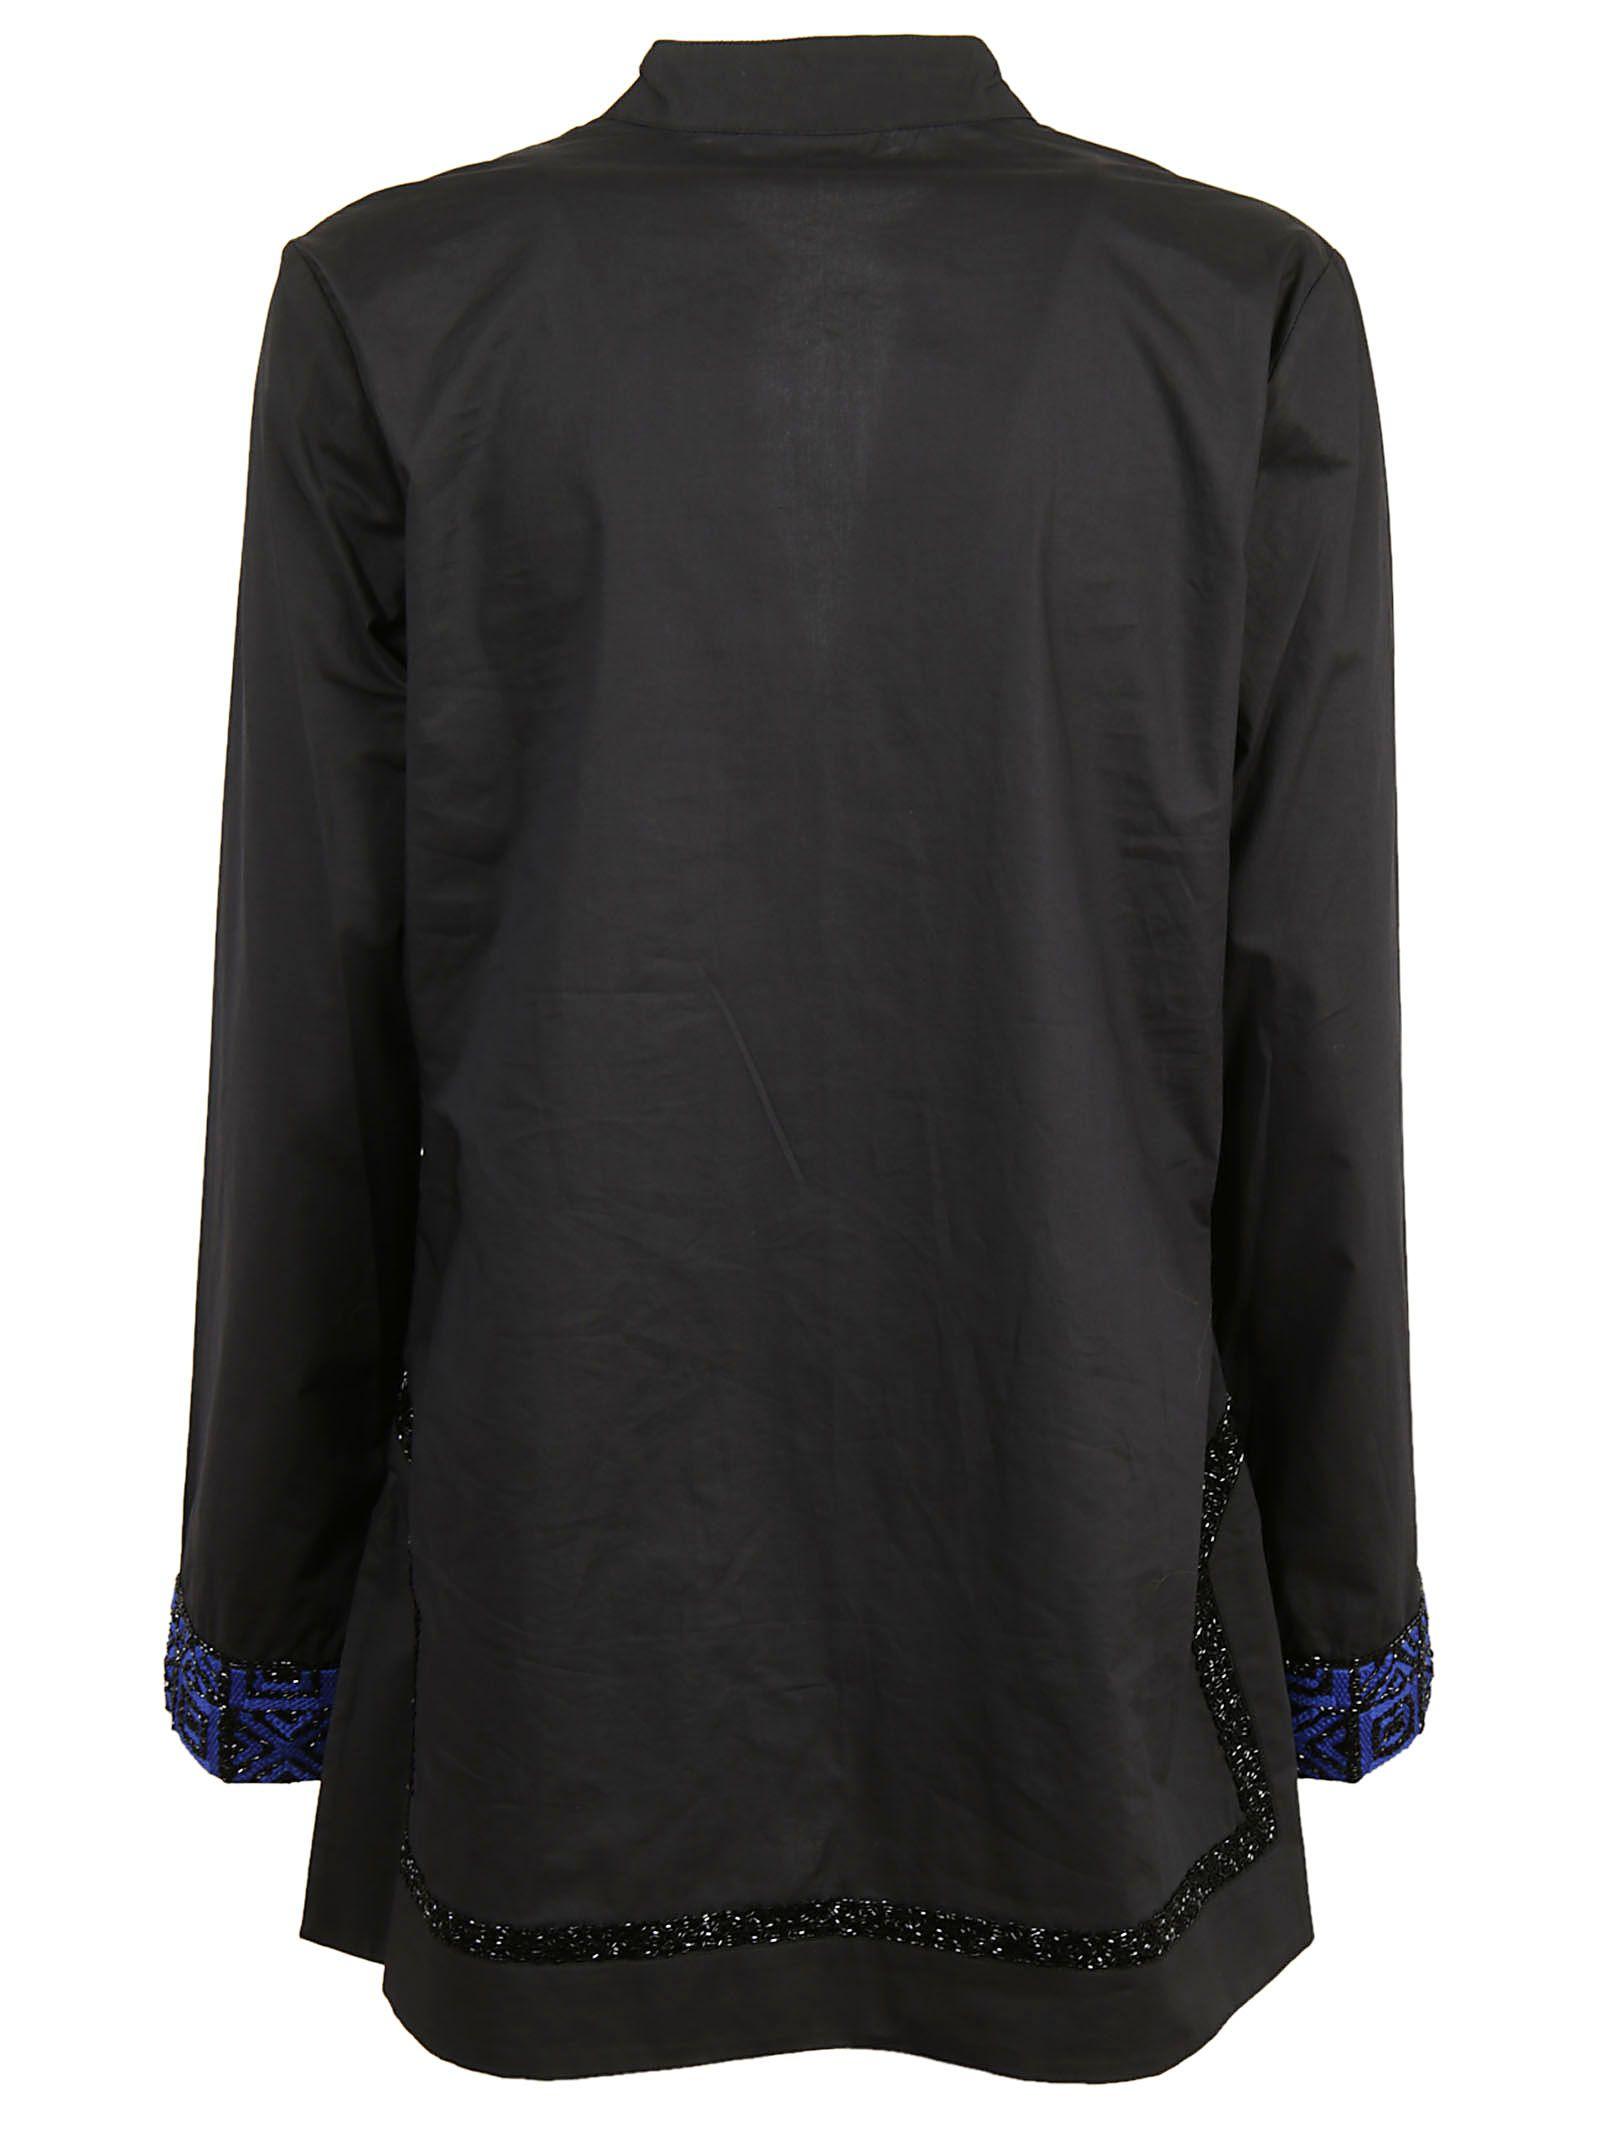 Tory Burch Embellished Tory Tunic Shirt